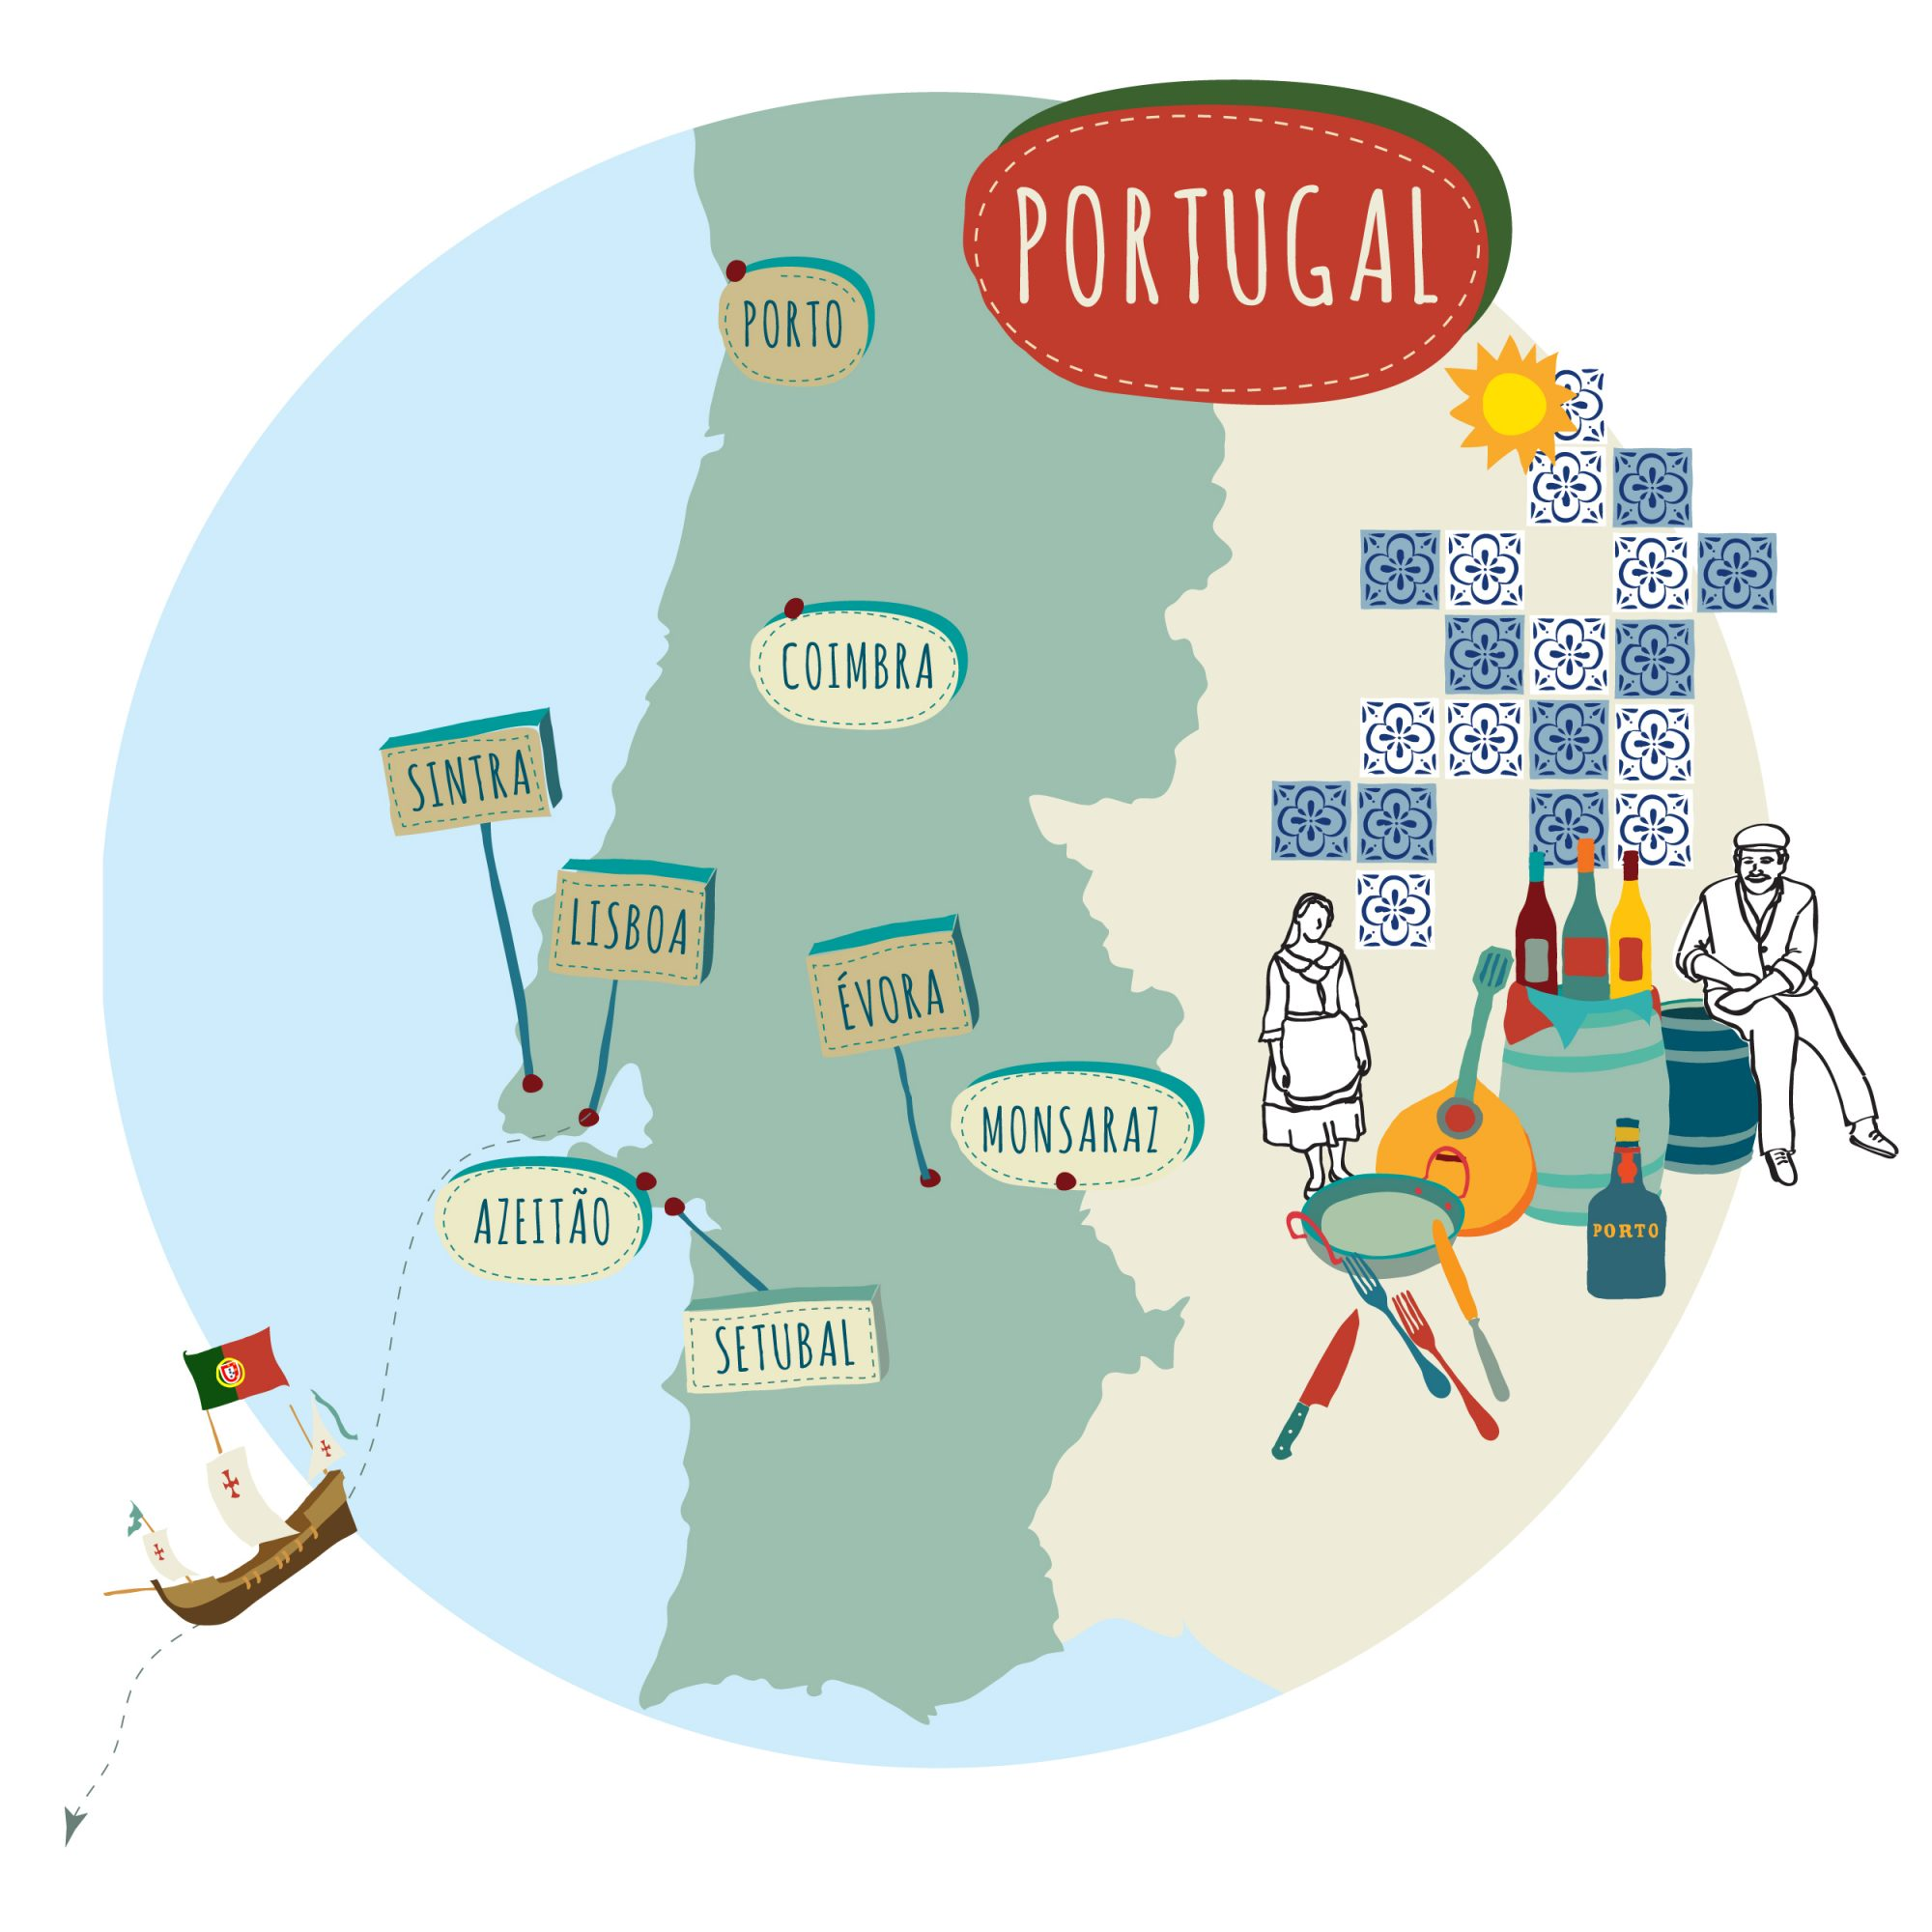 Portugal!! Apaixonante!!